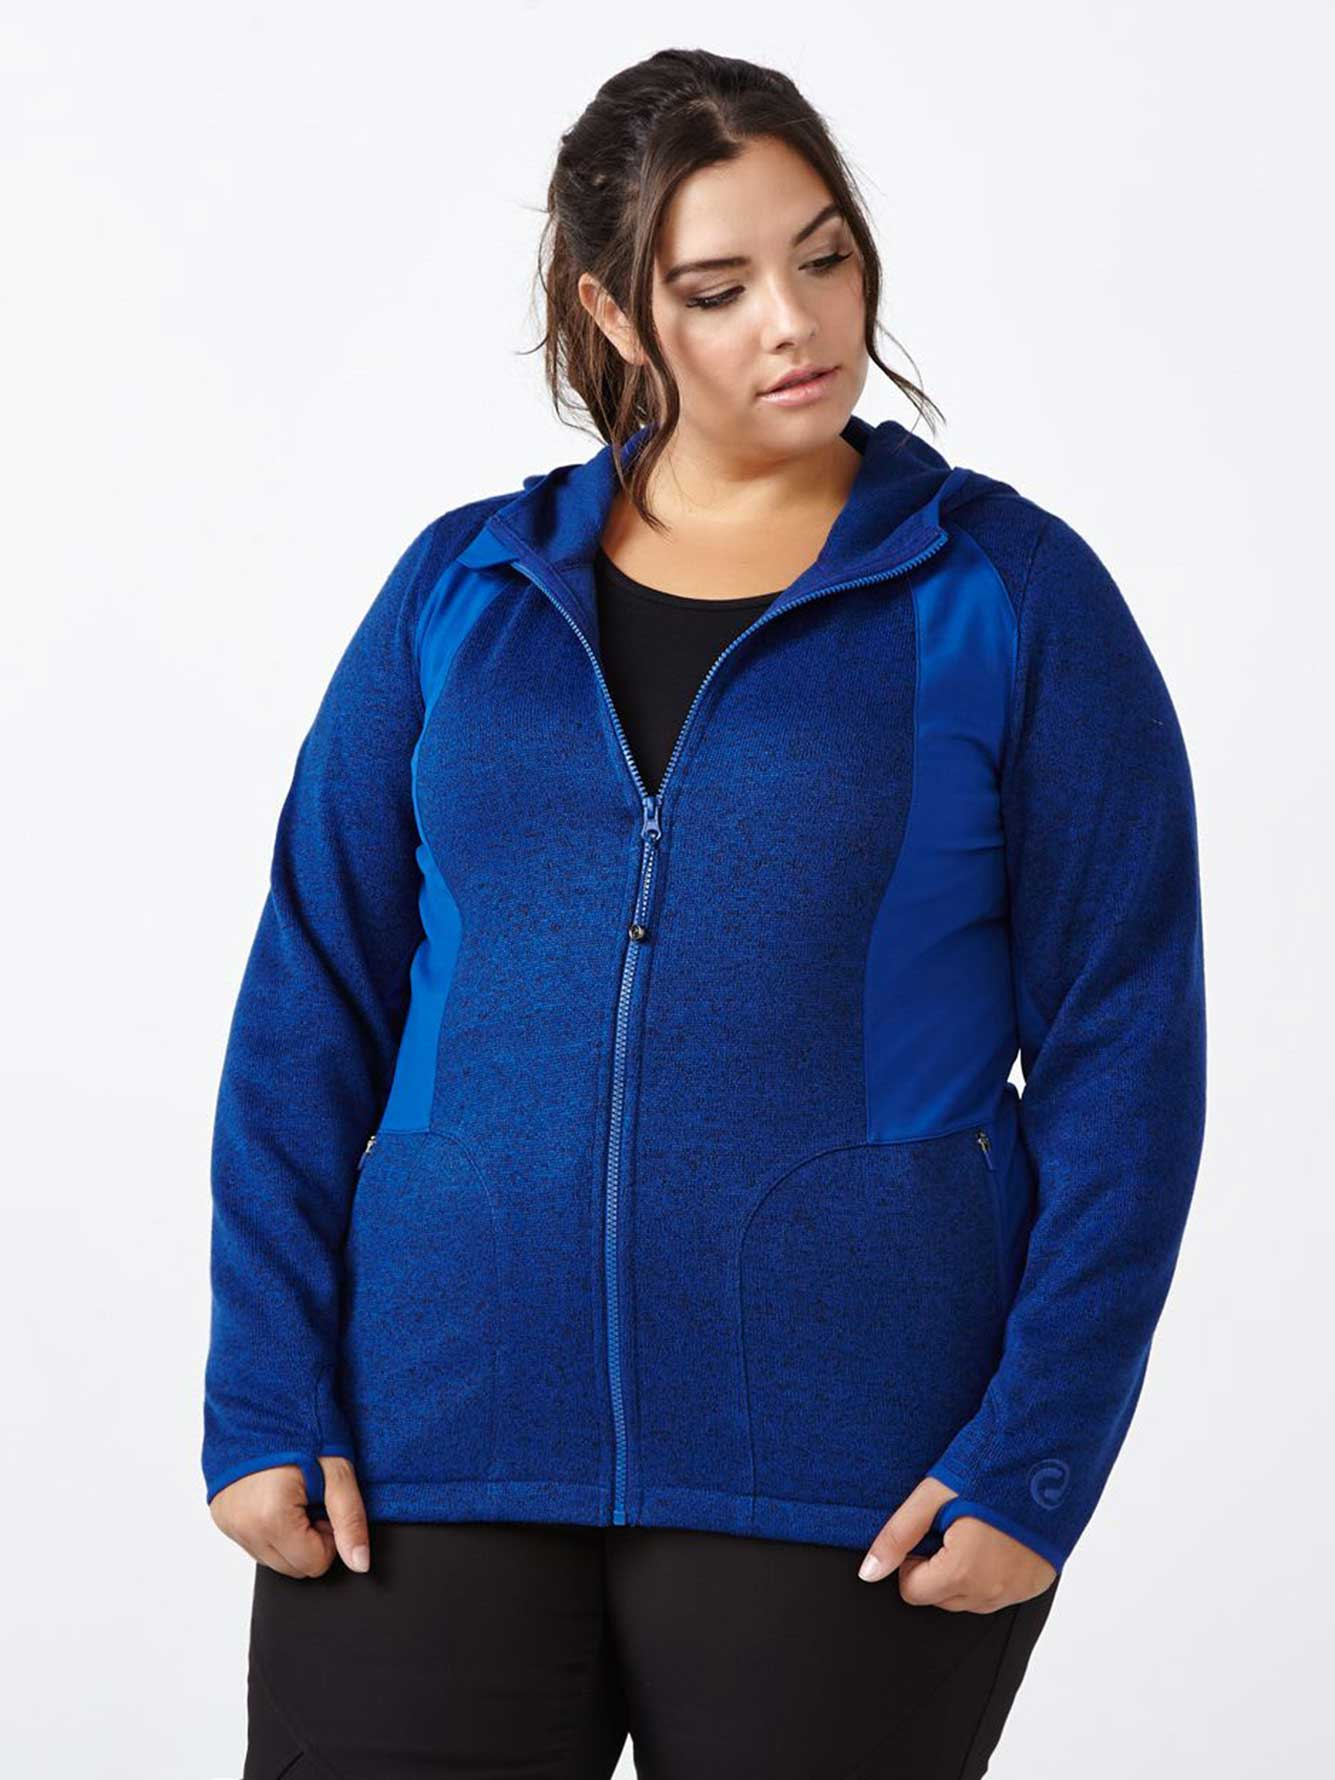 861fb4db279 Sports - Plus-Size Zip Up Hoodie